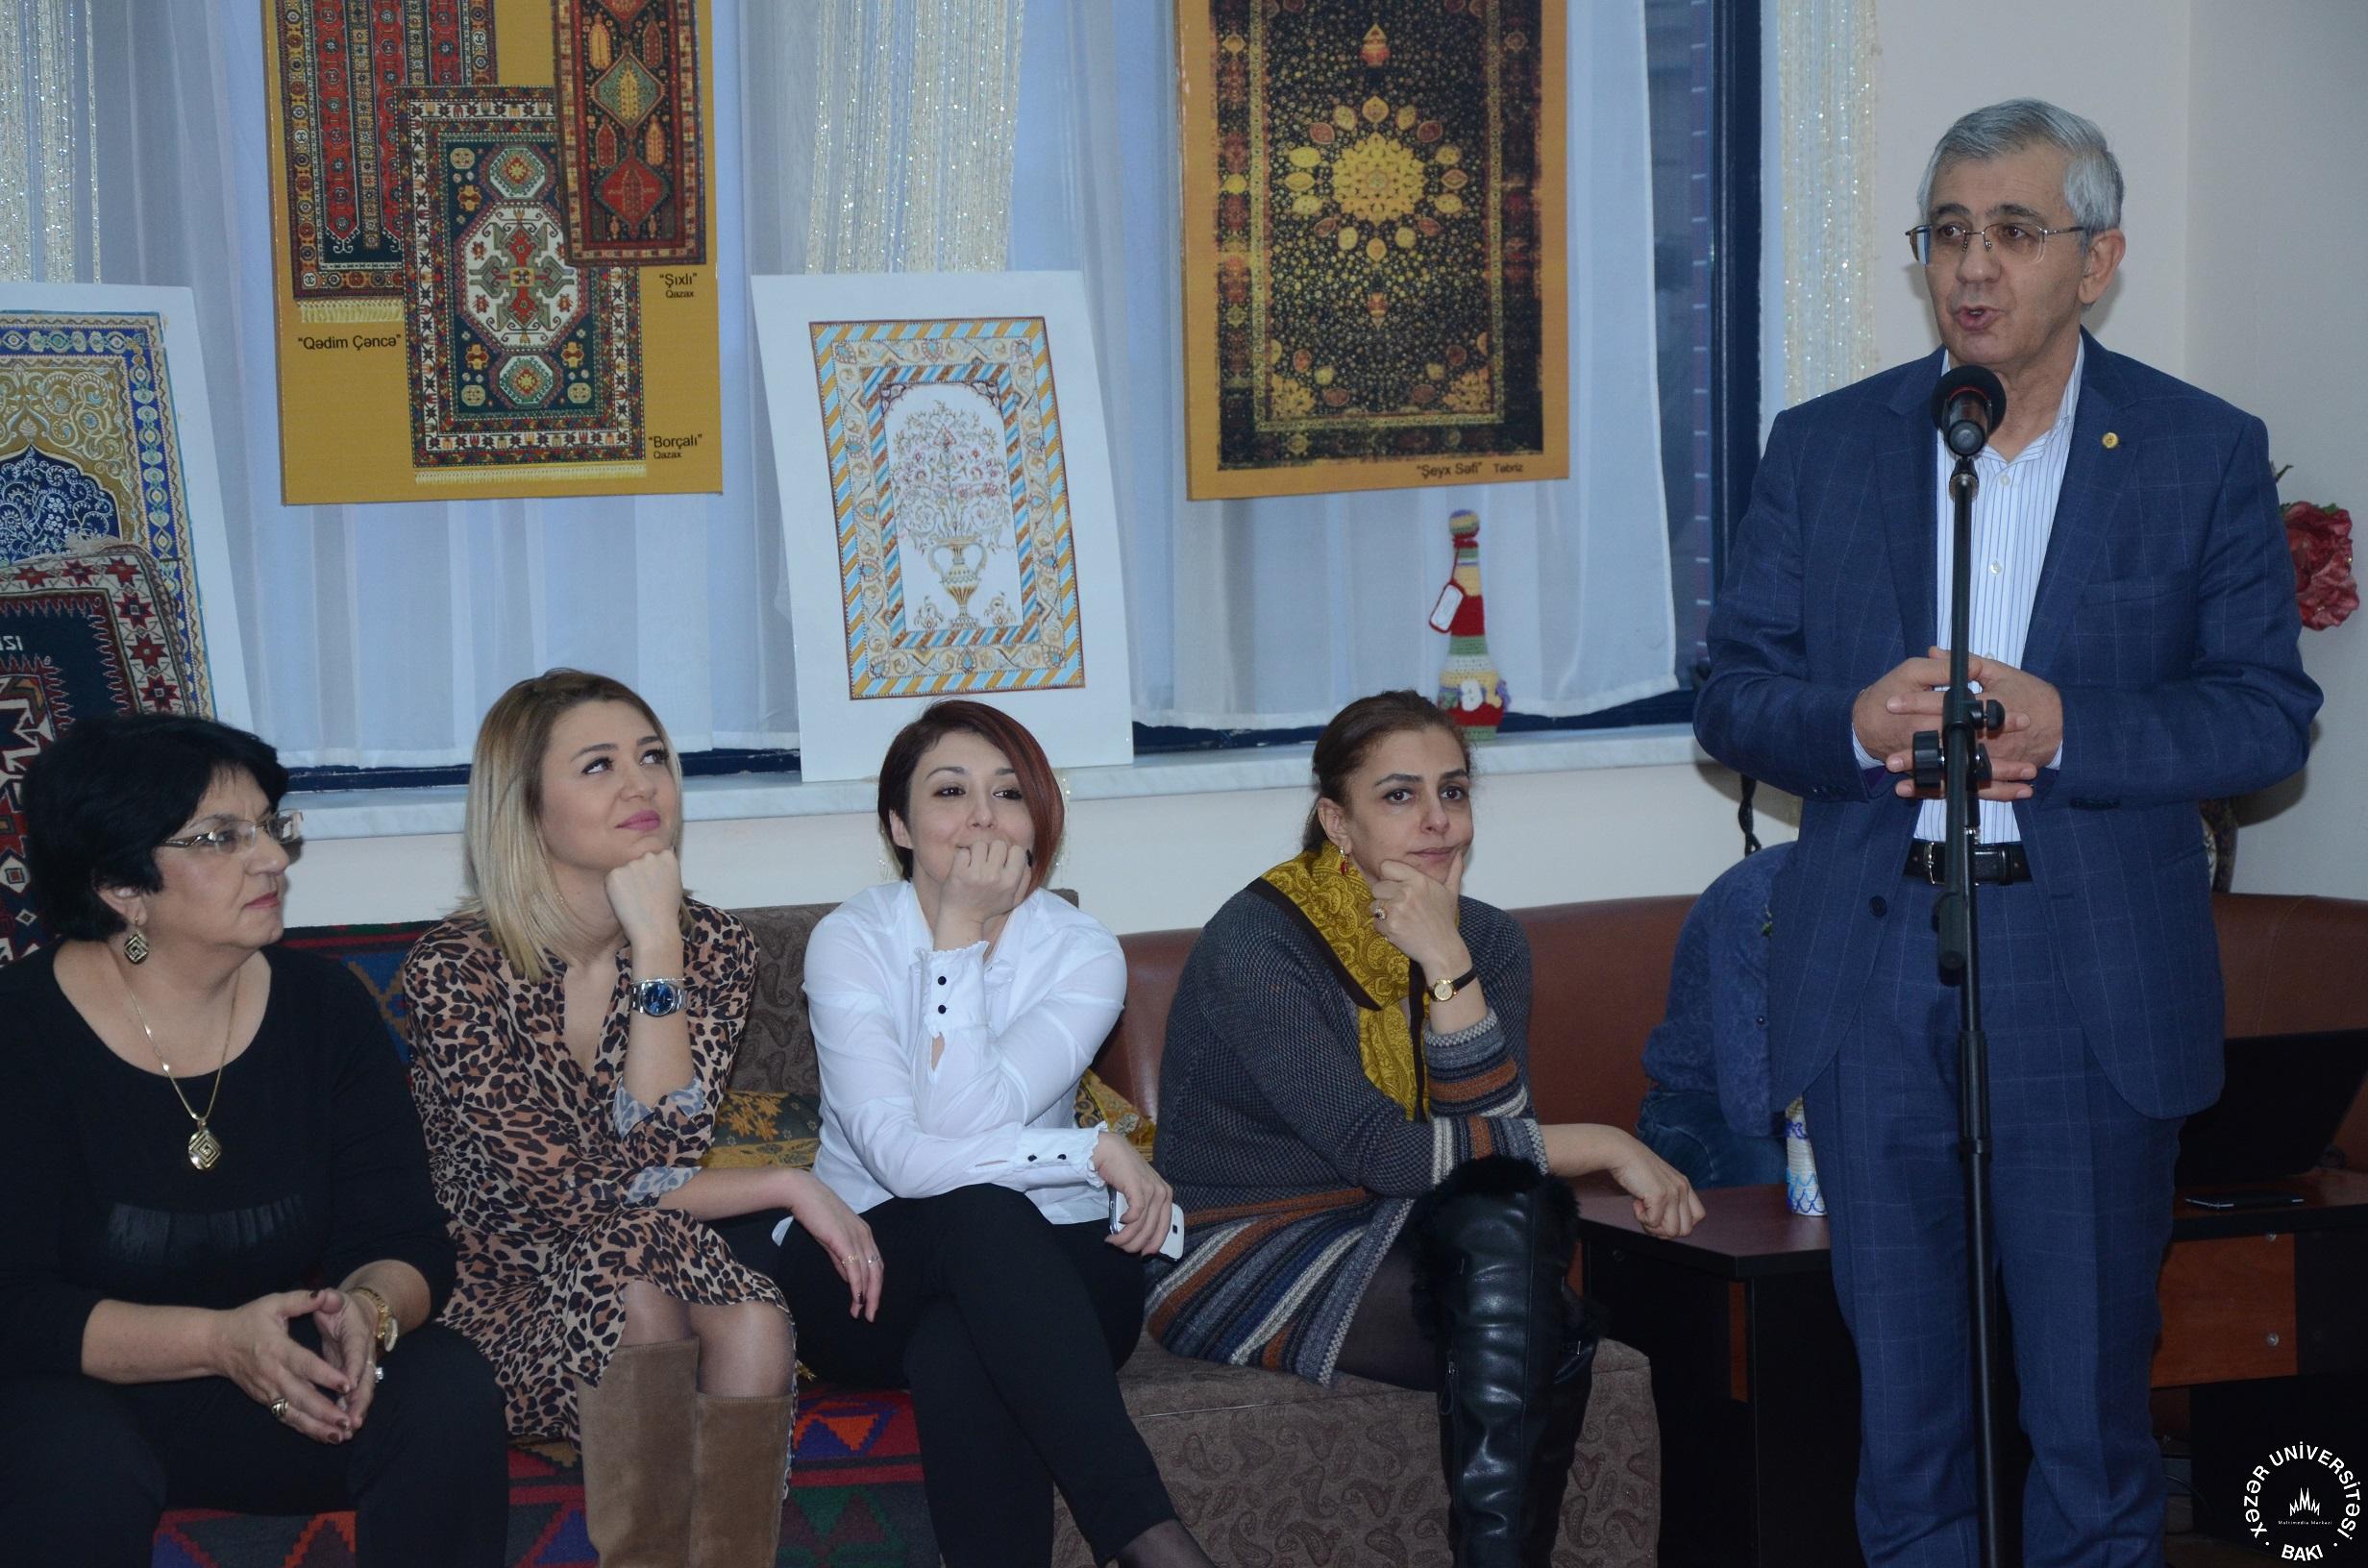 Farewell Party for Khazar Staff Member